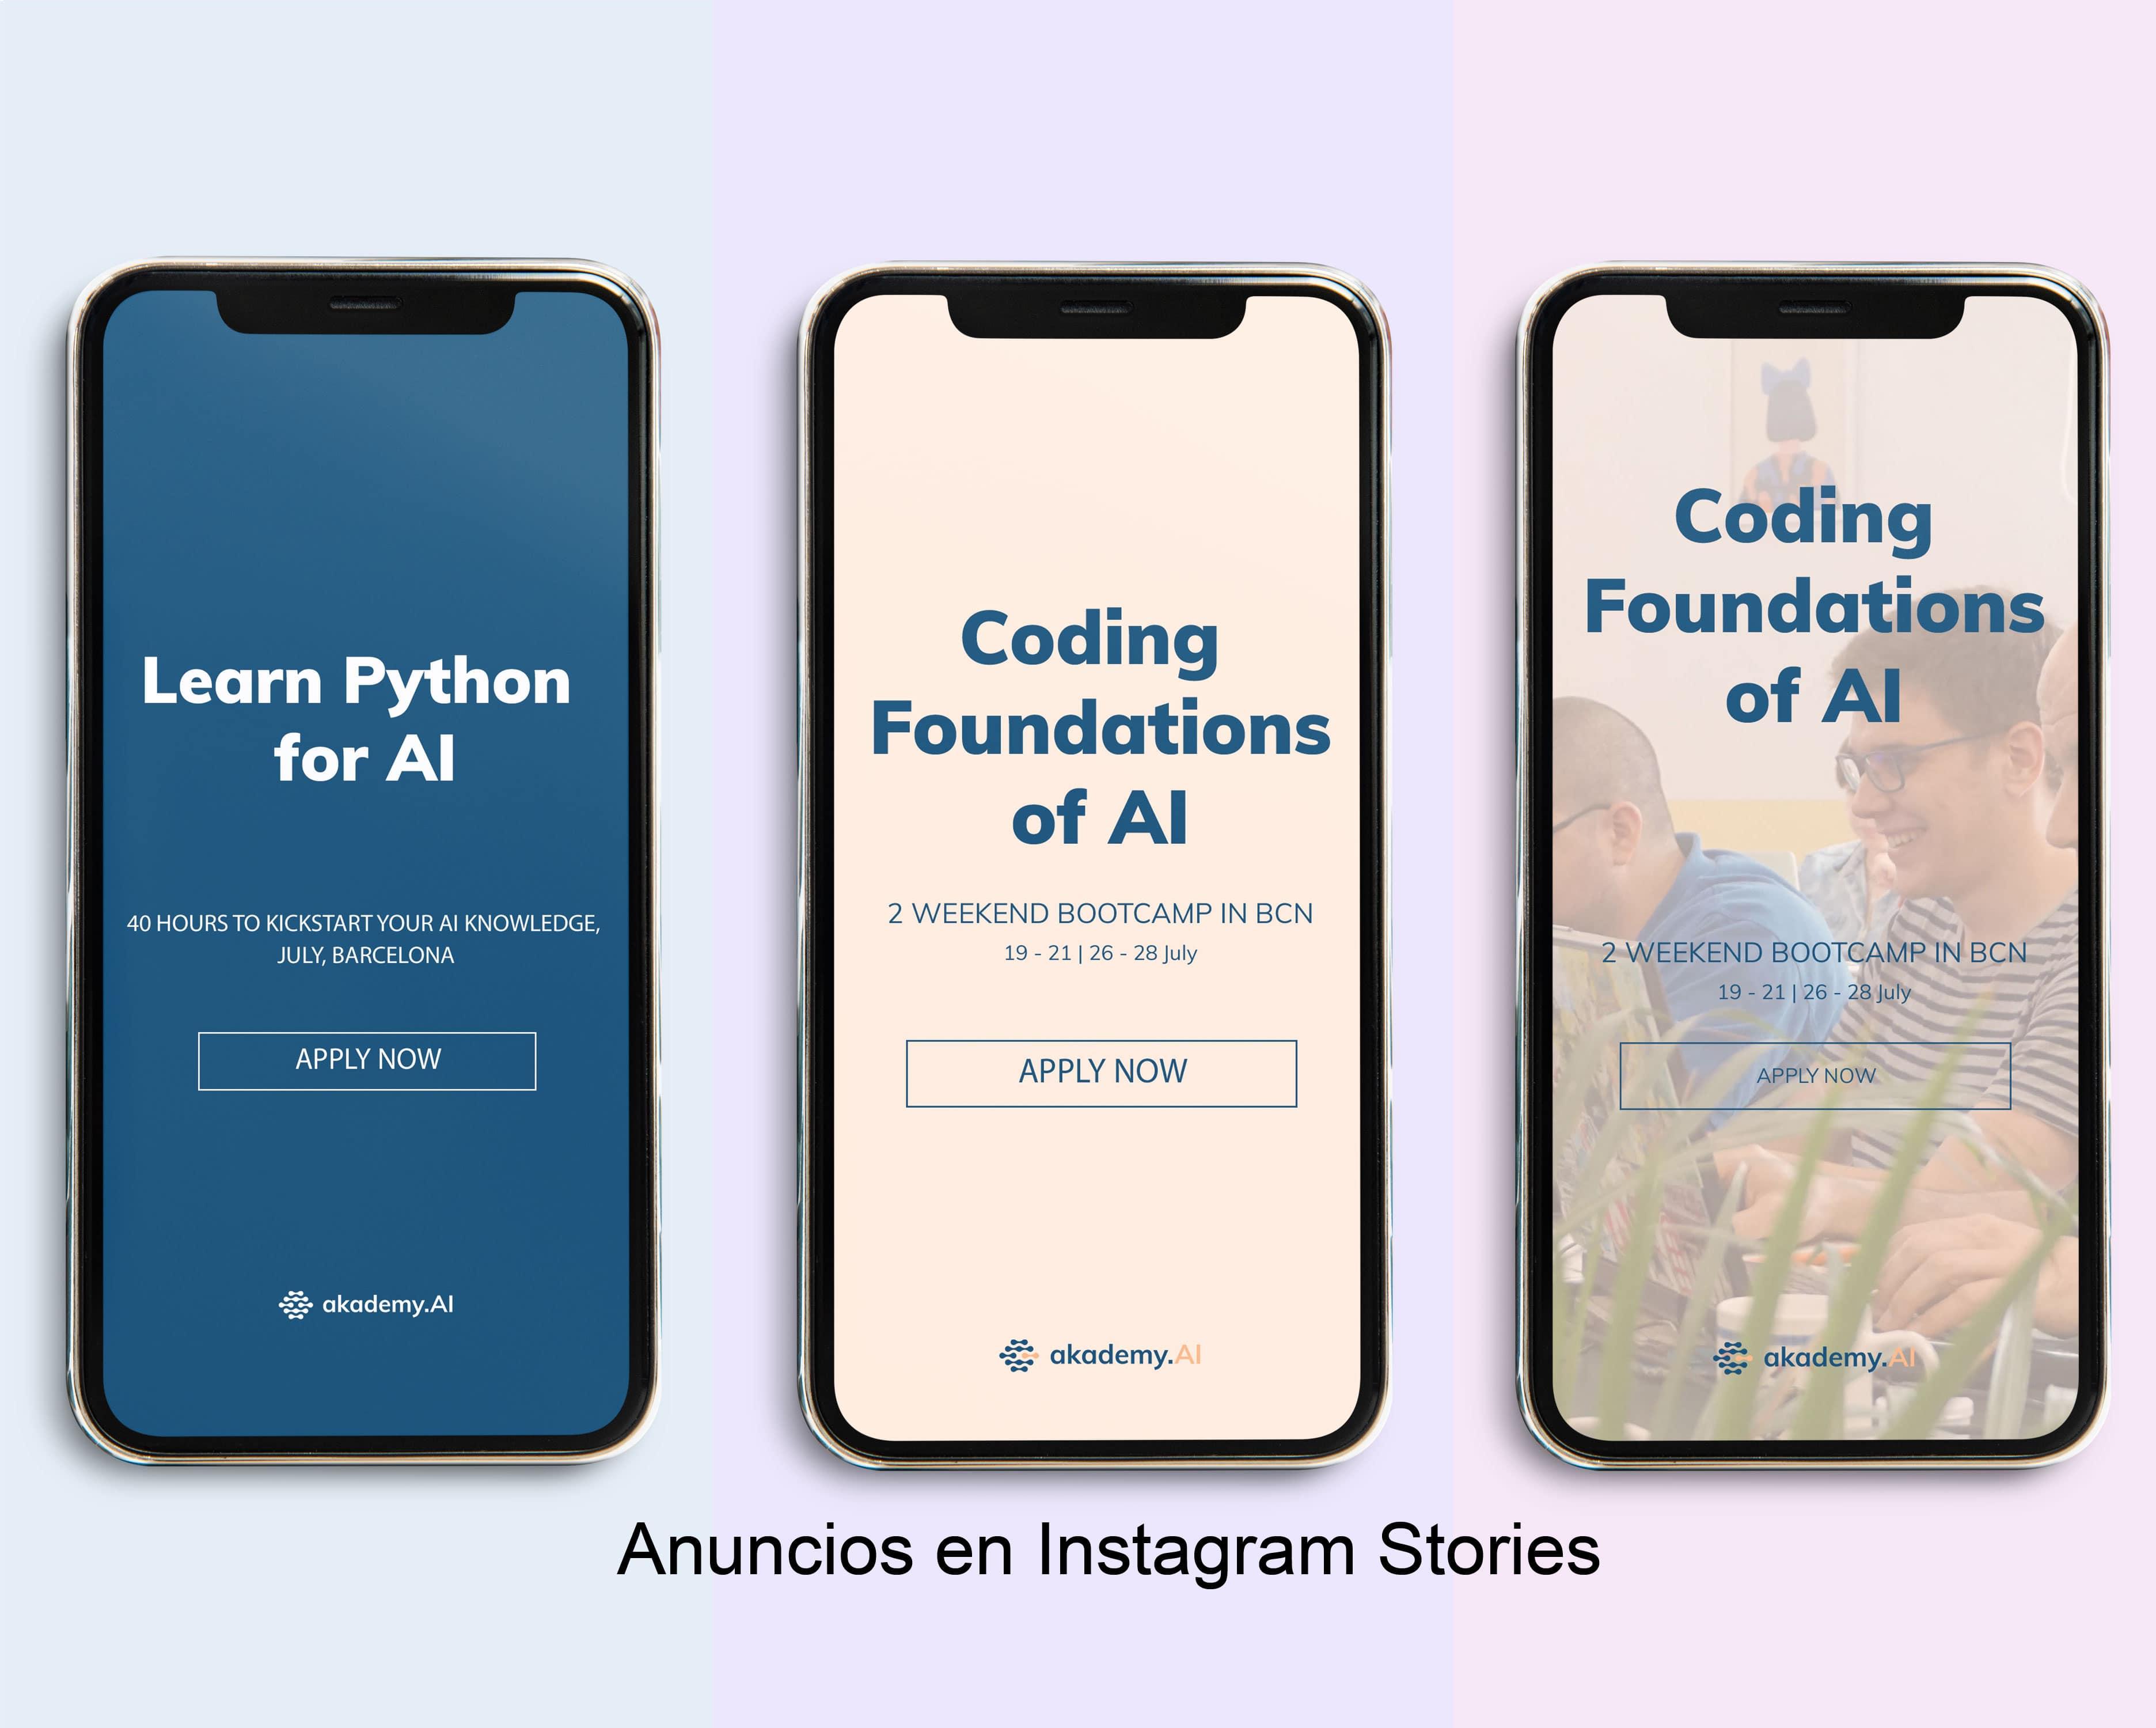 stories-anuncios-akademy